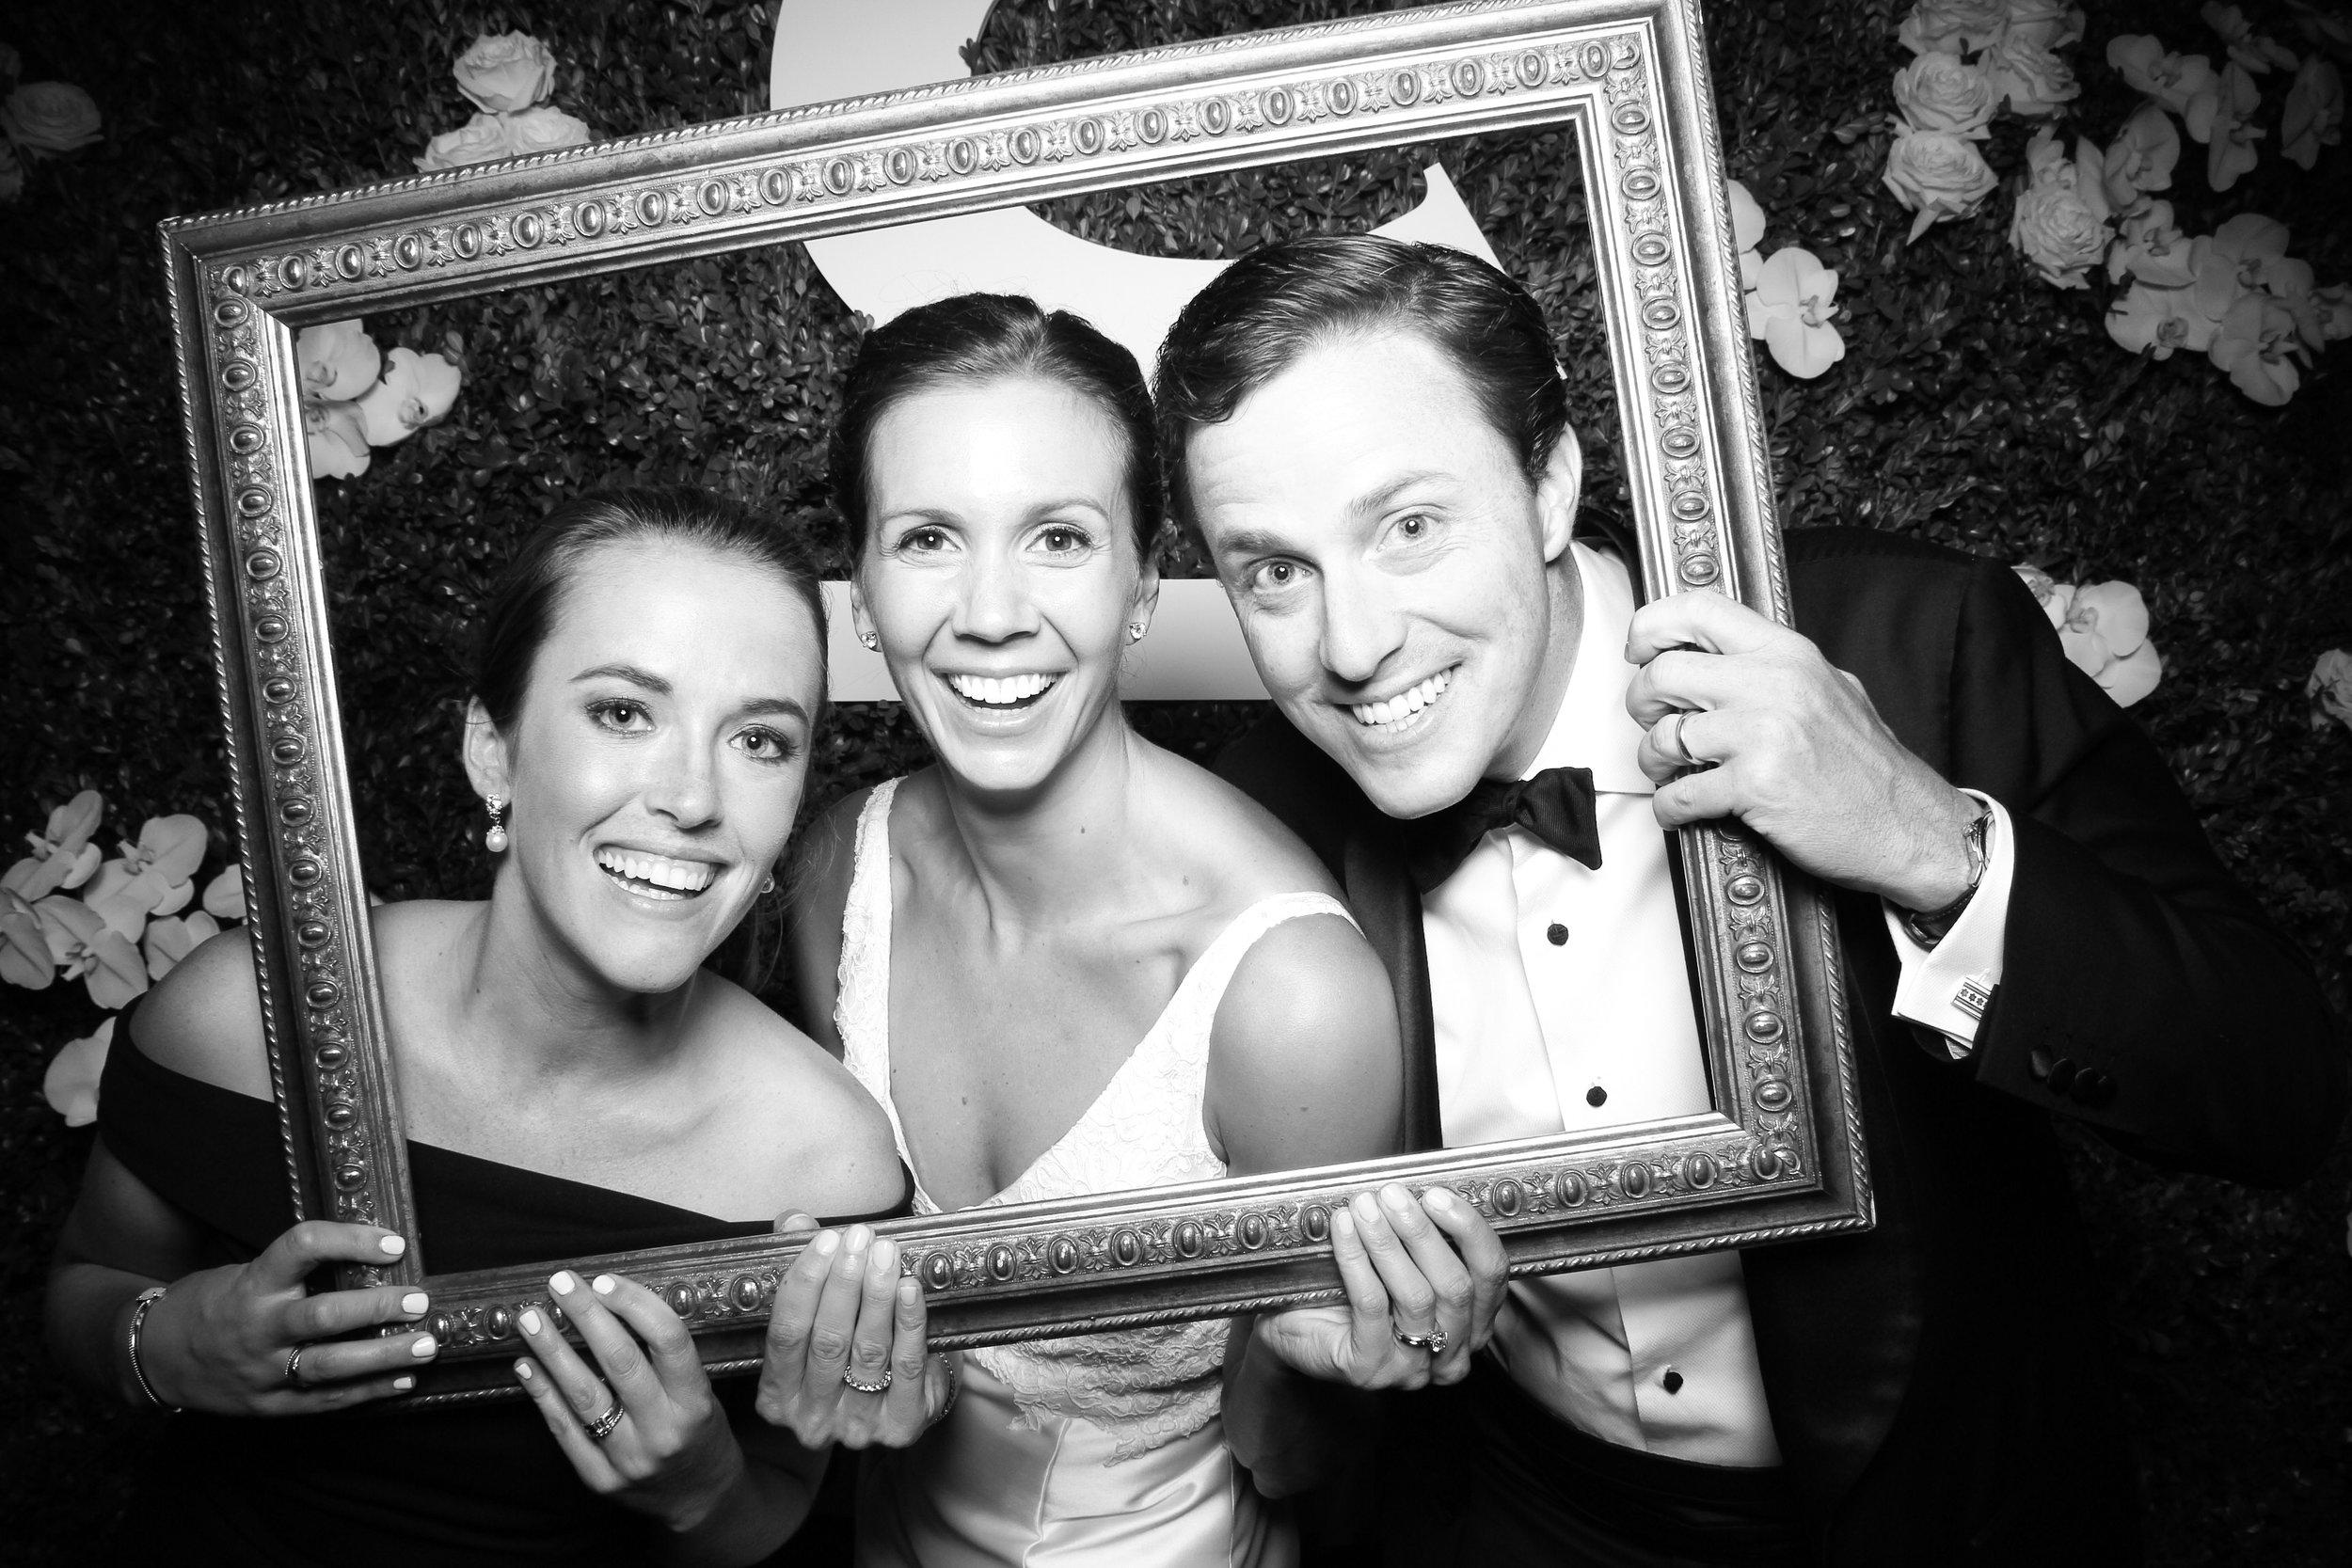 Peninsula_Hotel_Chicago_Wedding_Photo_Booth_10.jpg